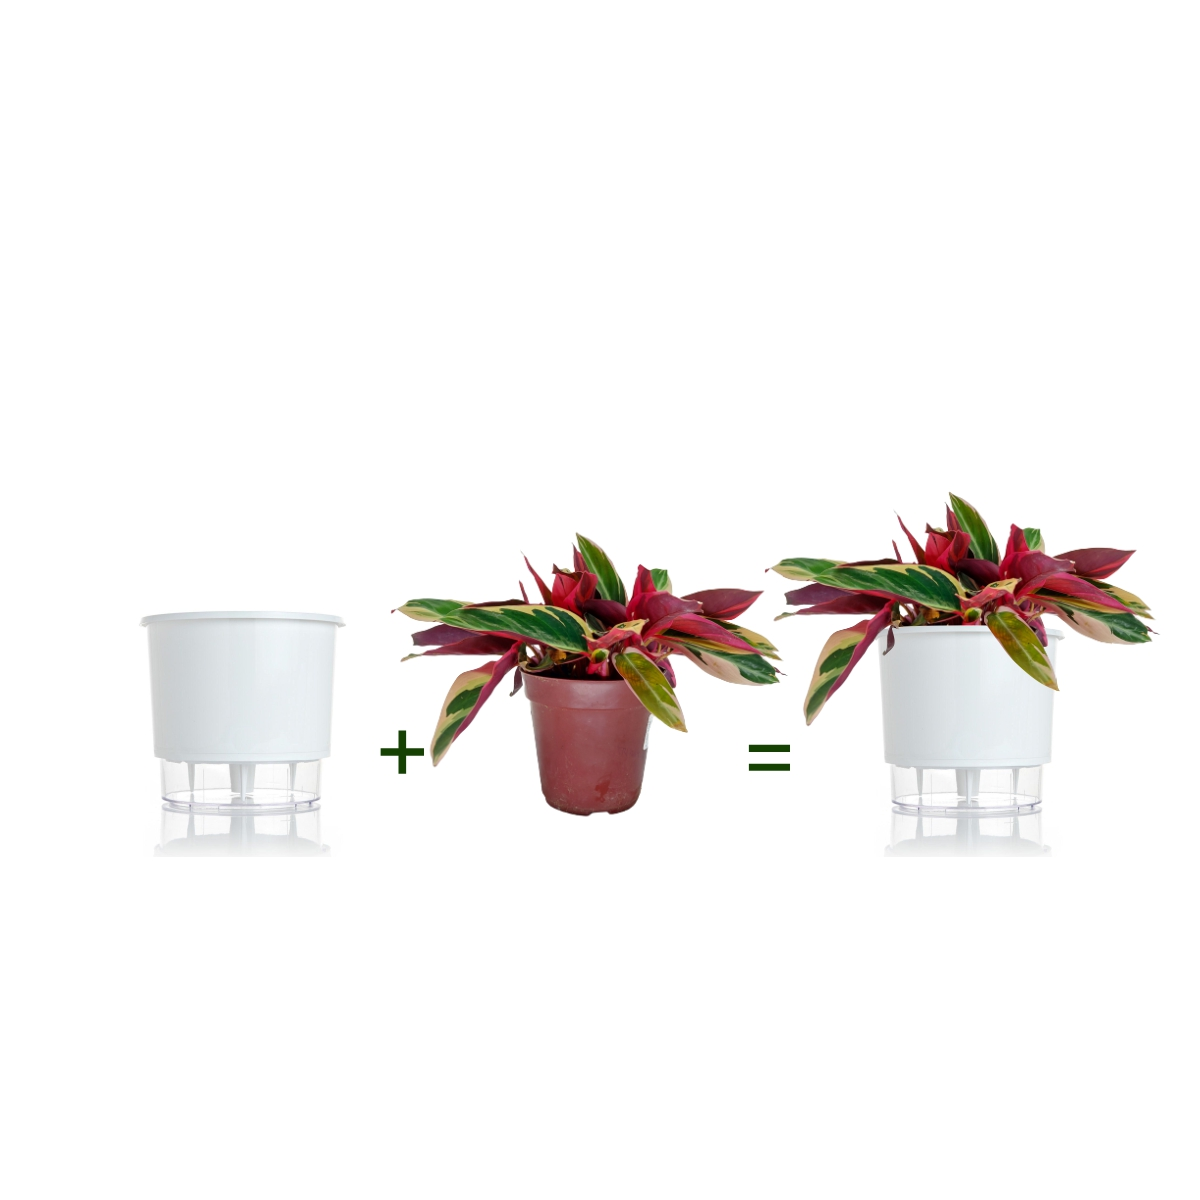 Kit Completo para plantio de Maranta Calathea Triostar com vaso autoirrigável Médio Branco